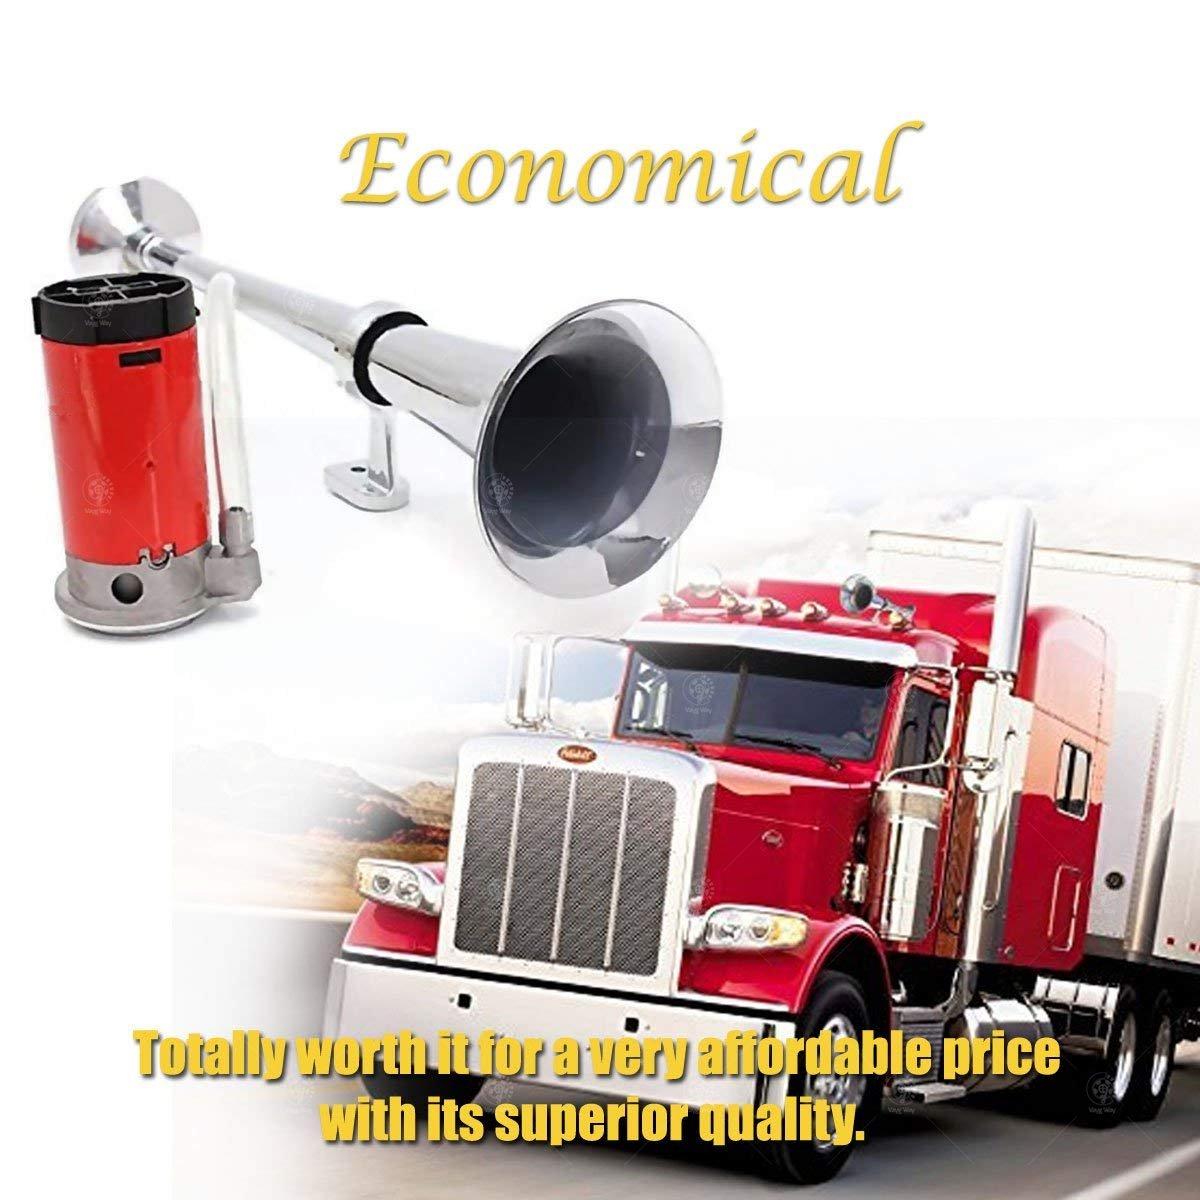 VaygWay Air Horn 12v Loud-150DB Train Horn Compressor Kit-Single Trumpet Car Air Horn-Truck Vehicle Train Horn Kit